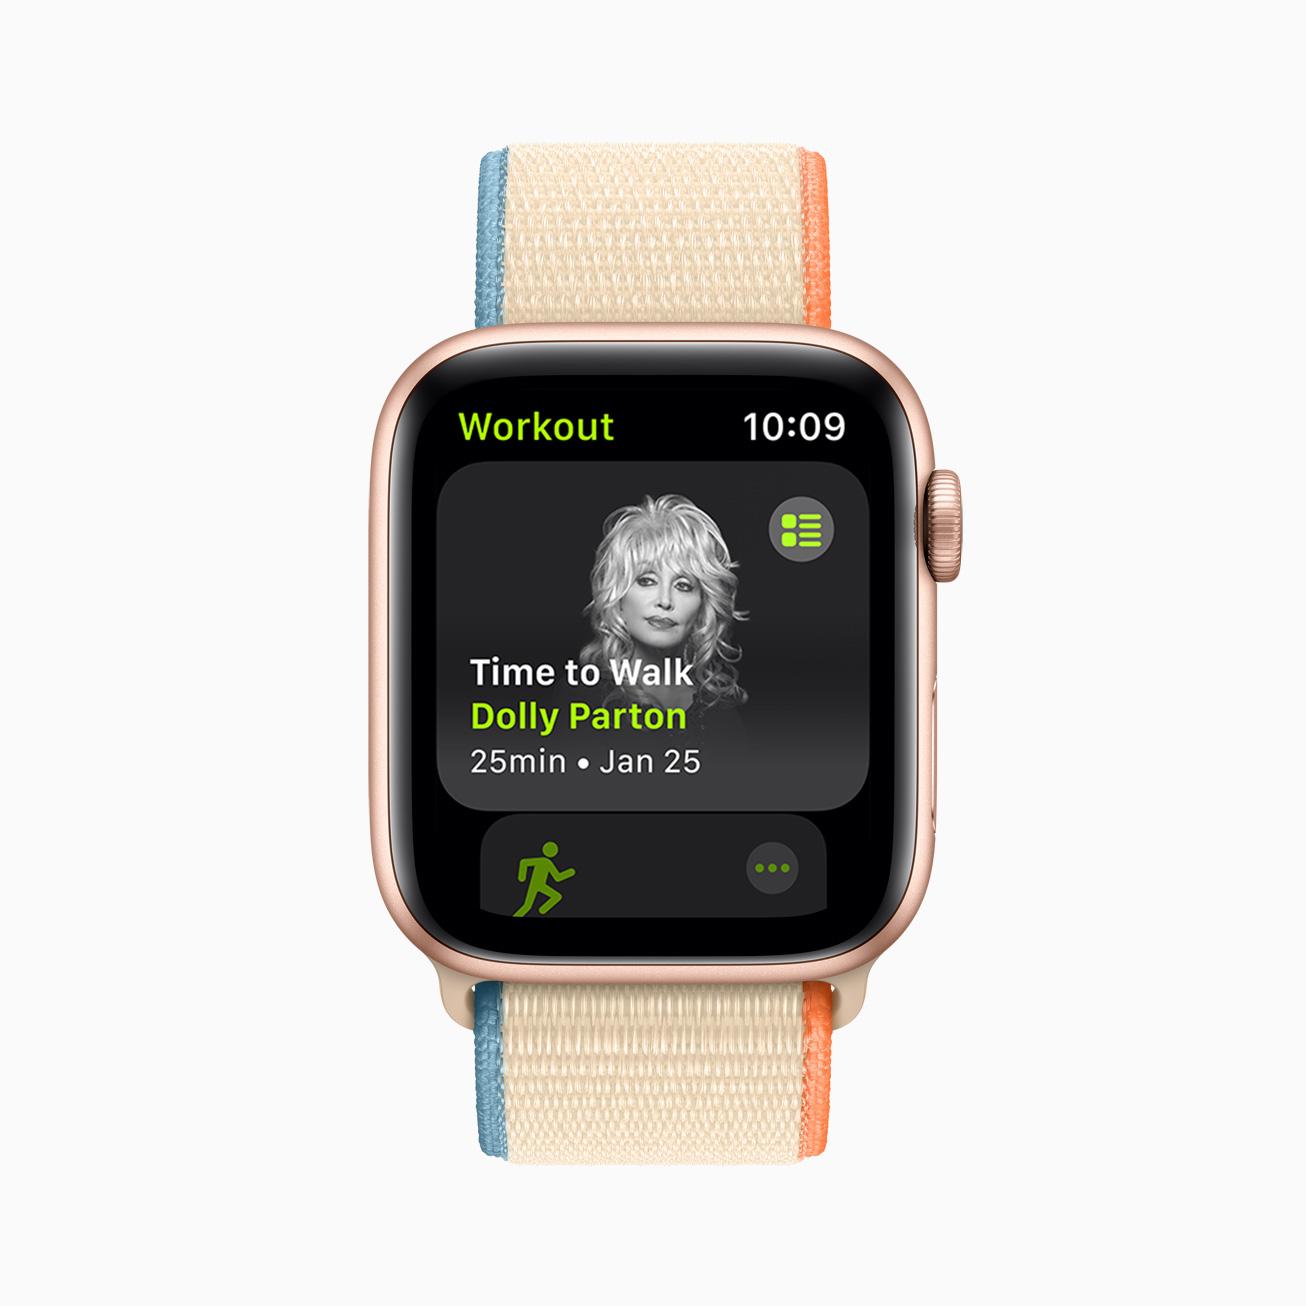 apple_time-to-walk_apple-watch-dolly-parton_01252021_carousel.jpg.large_2x.jpg